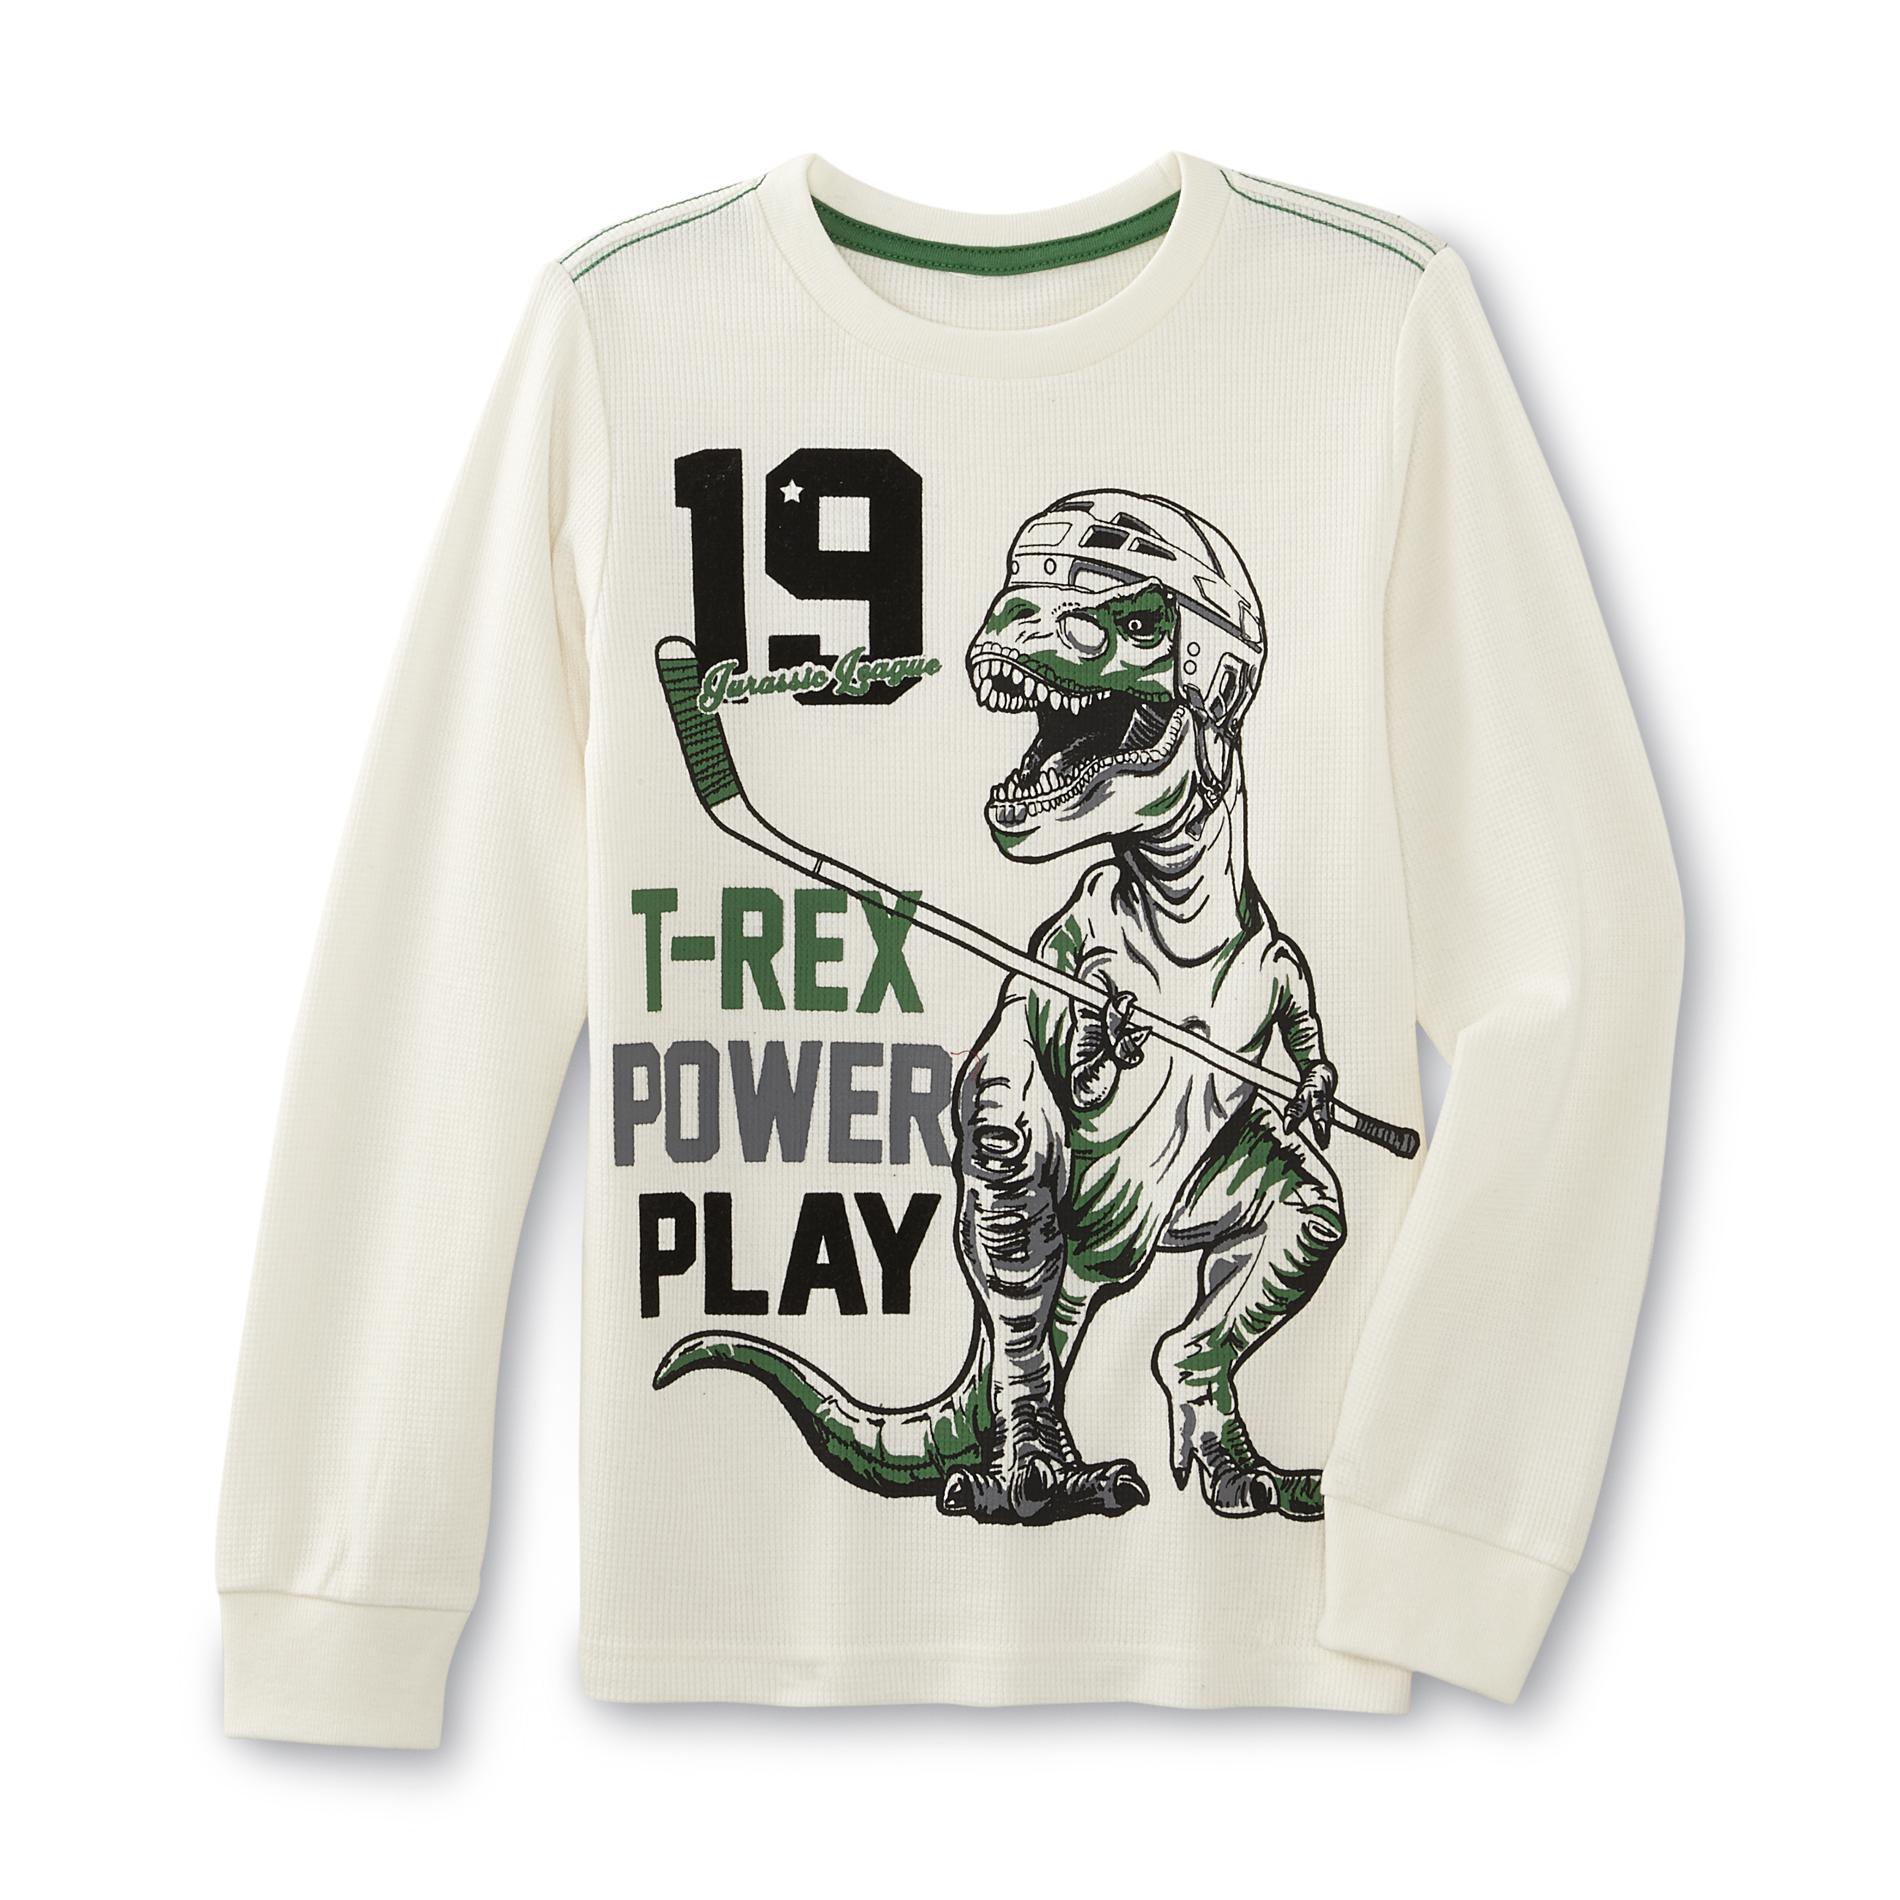 Toughskins Boy's Thermal Shirt - T-Rex Power Play